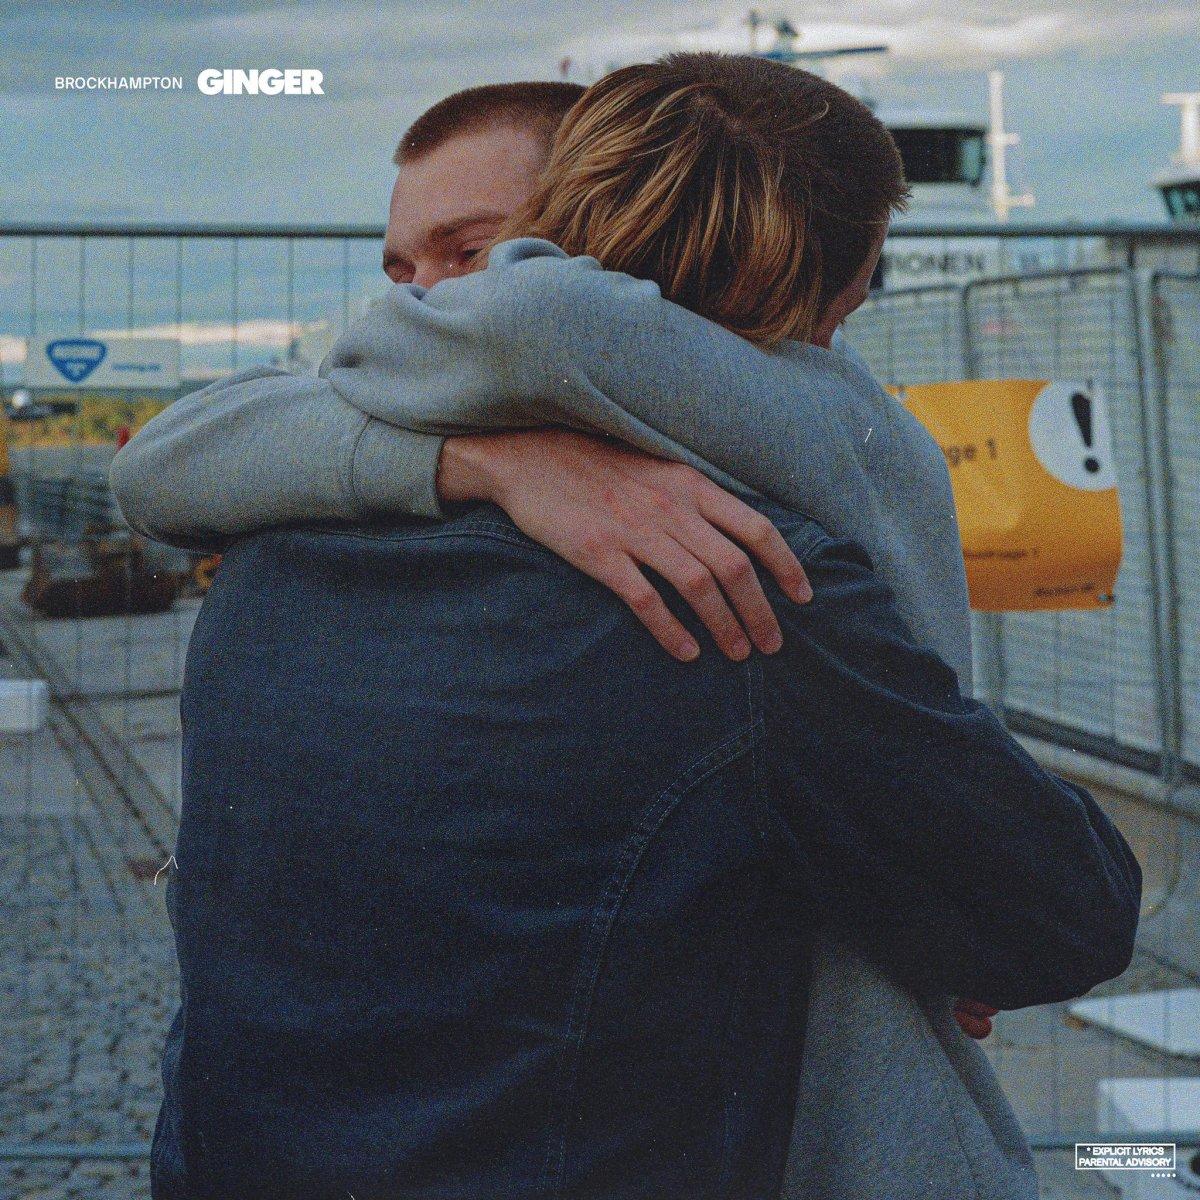 Brockhampton Ginger dischi luglio agosto 2019